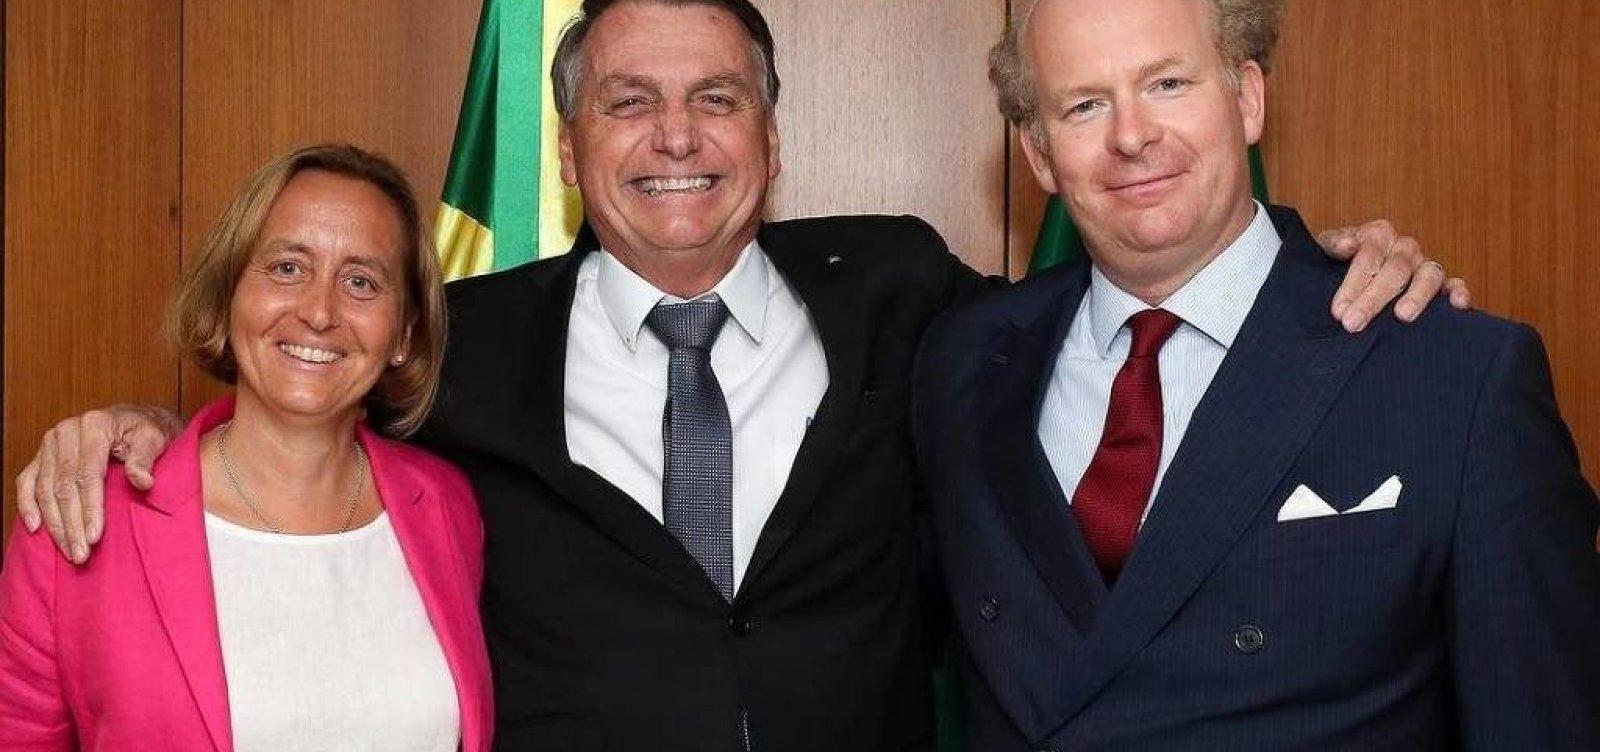 Fora da agenda, Bolsonaro recebe deputada da ultradireita alemã neta de ministro nazista